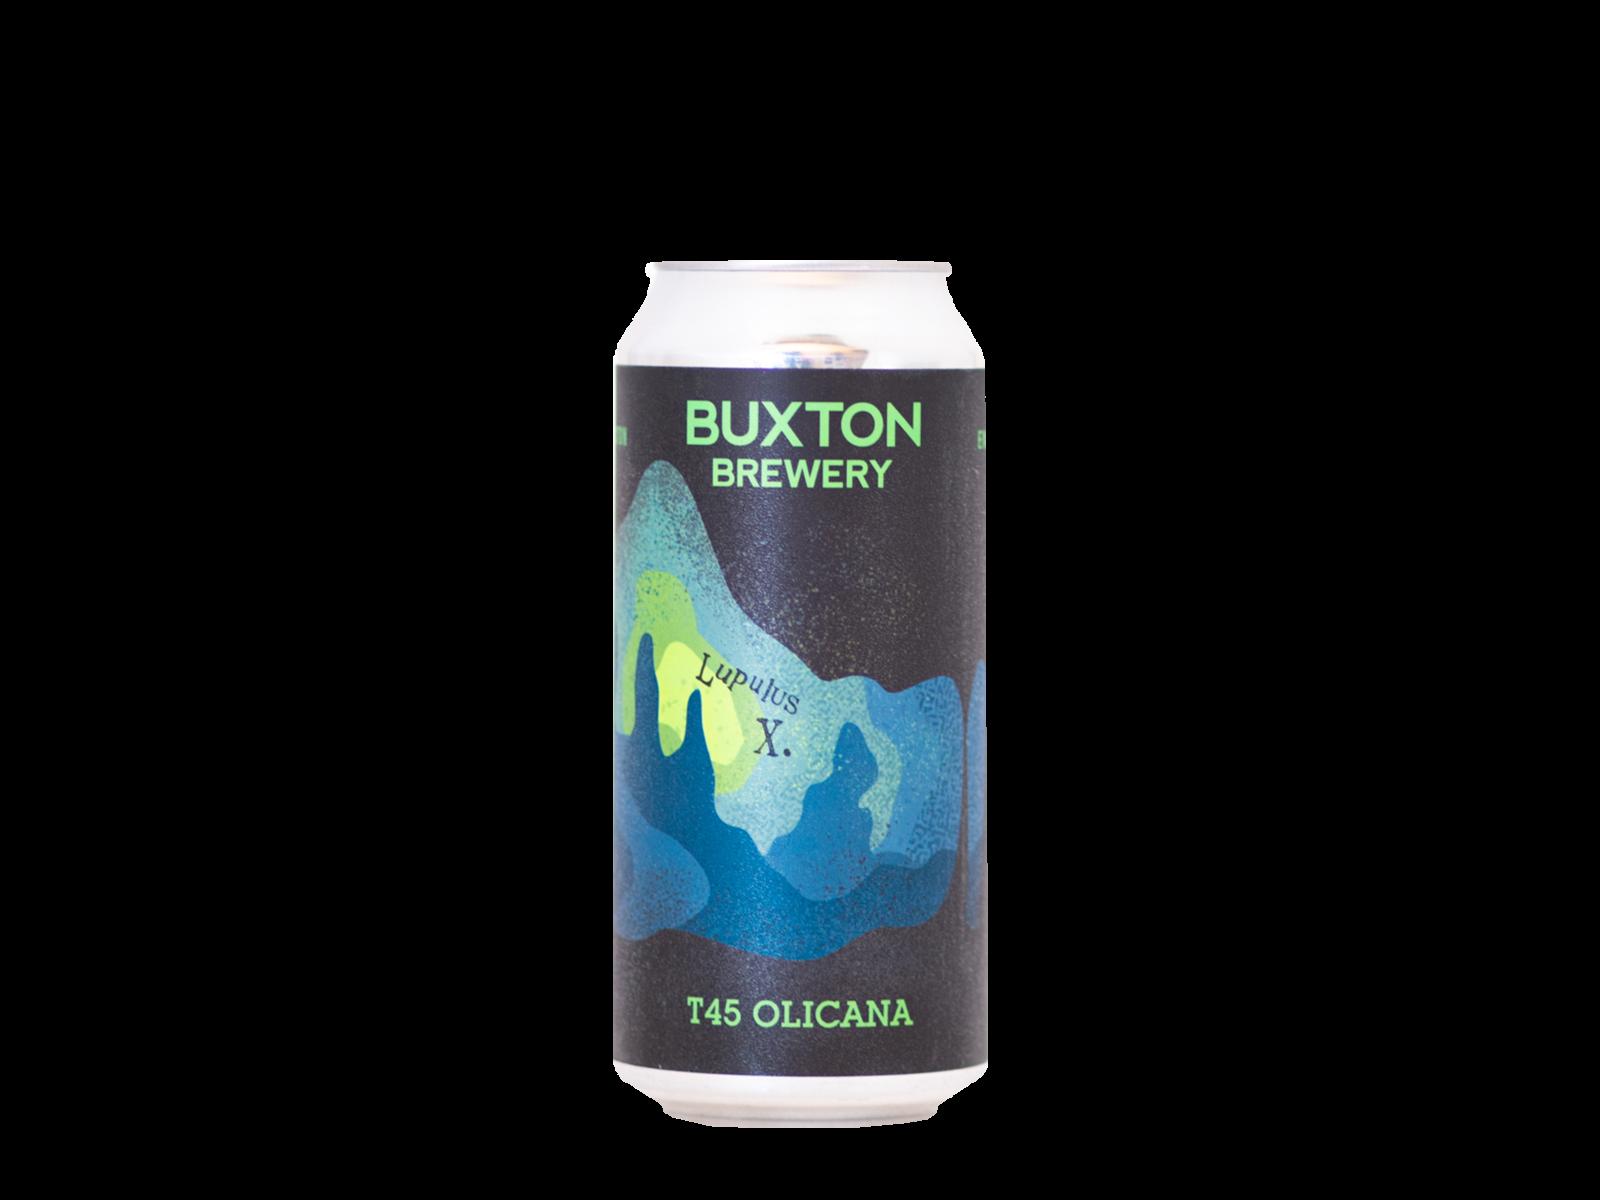 Buxton / LupulusX Olicana SH IPA